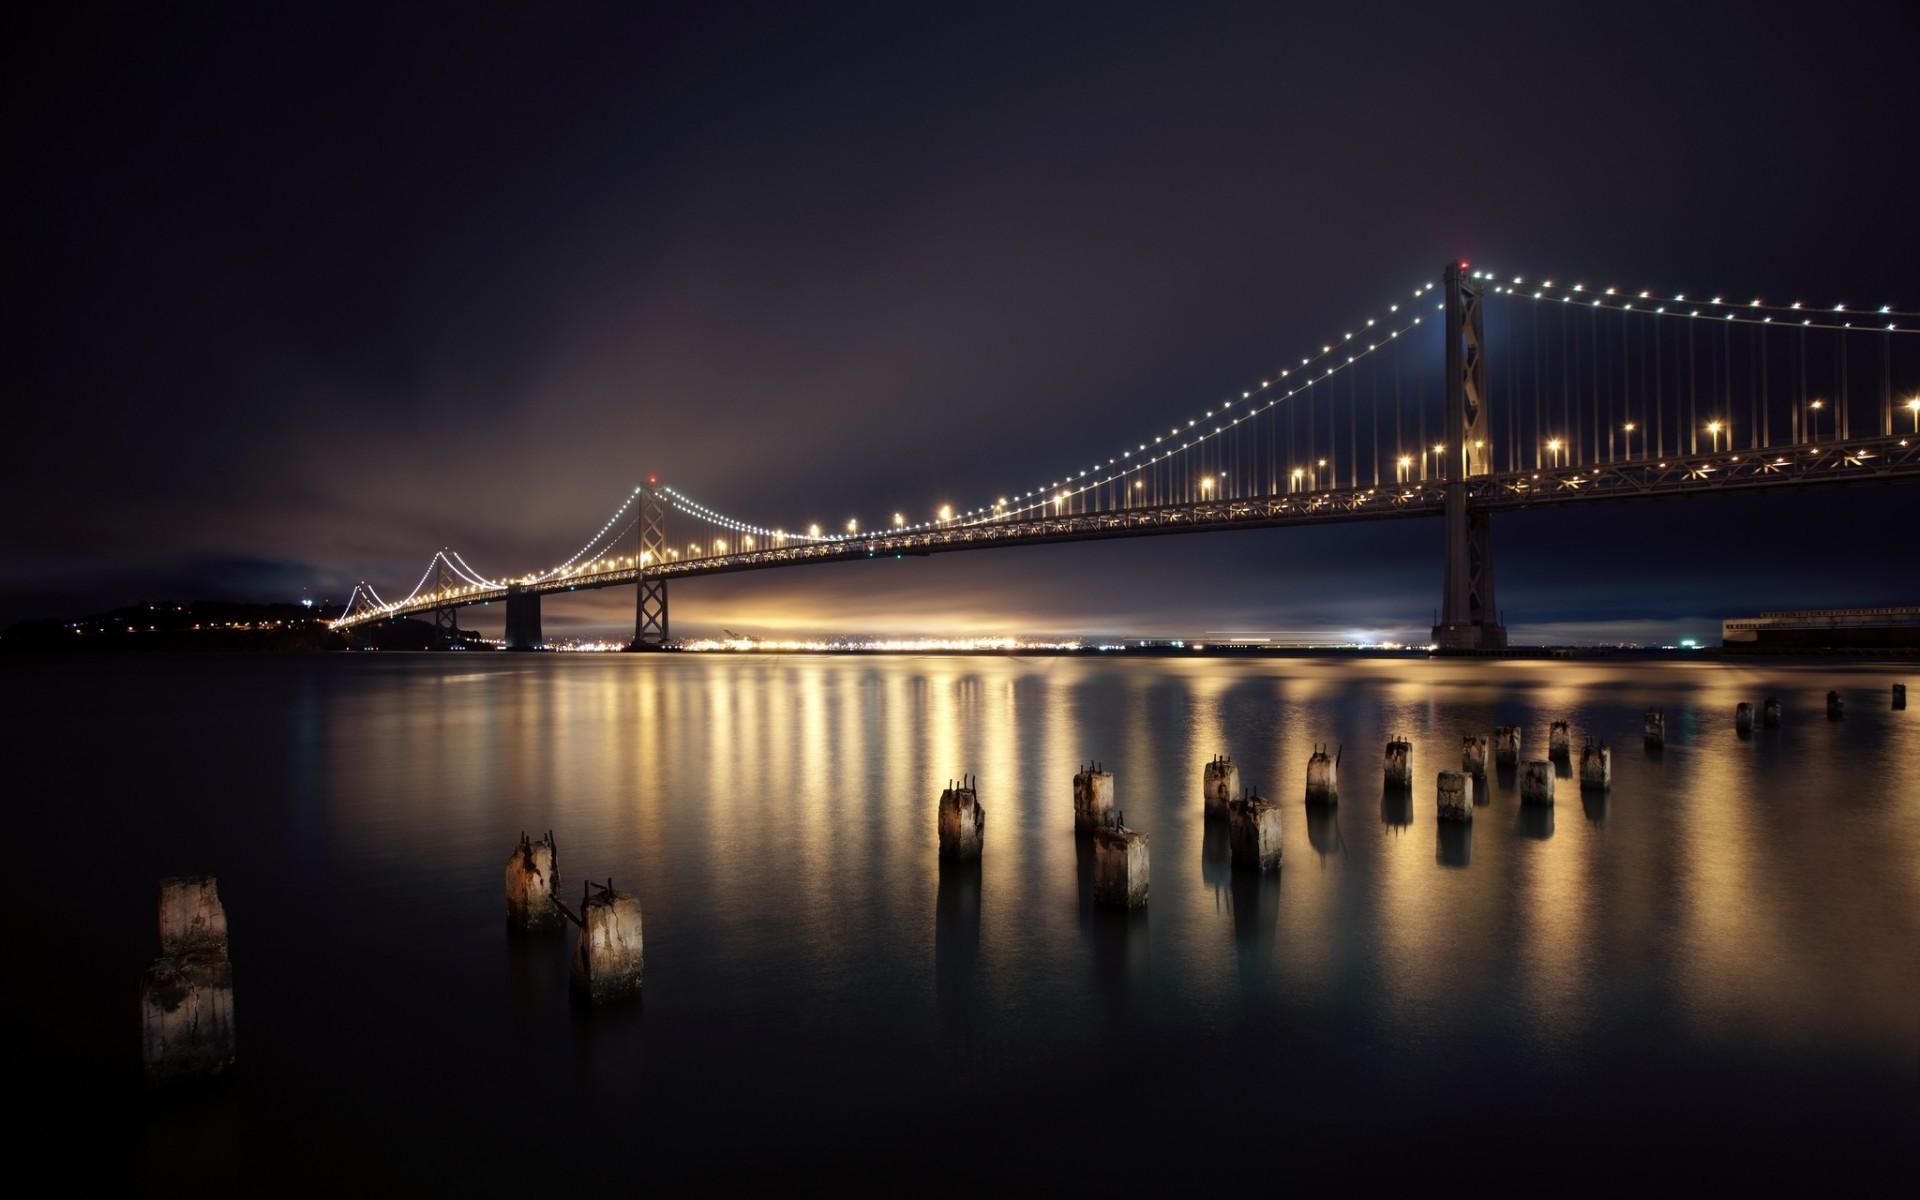 light bridge wallpaper - photo #28